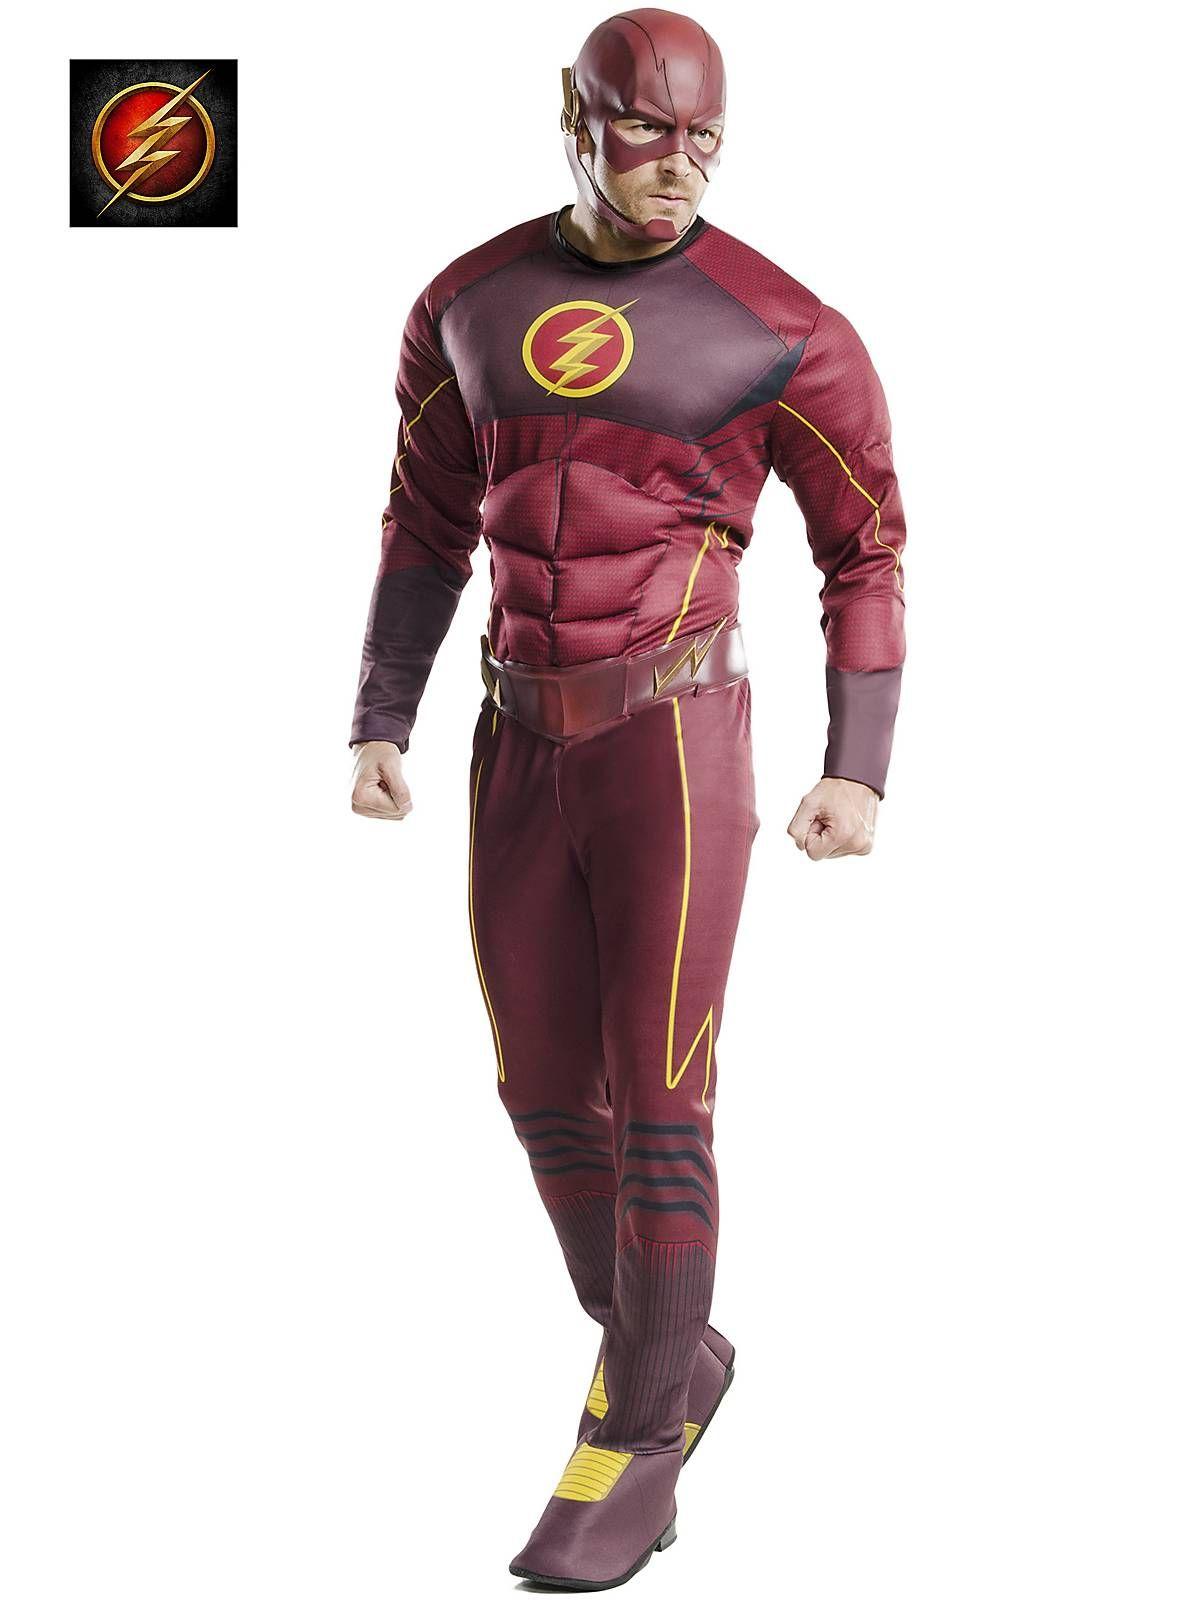 LICENSED THE FLASH MENS SUPERHERO DC COMICS ADULT DRESS UP HALLOWEEN COSTUME